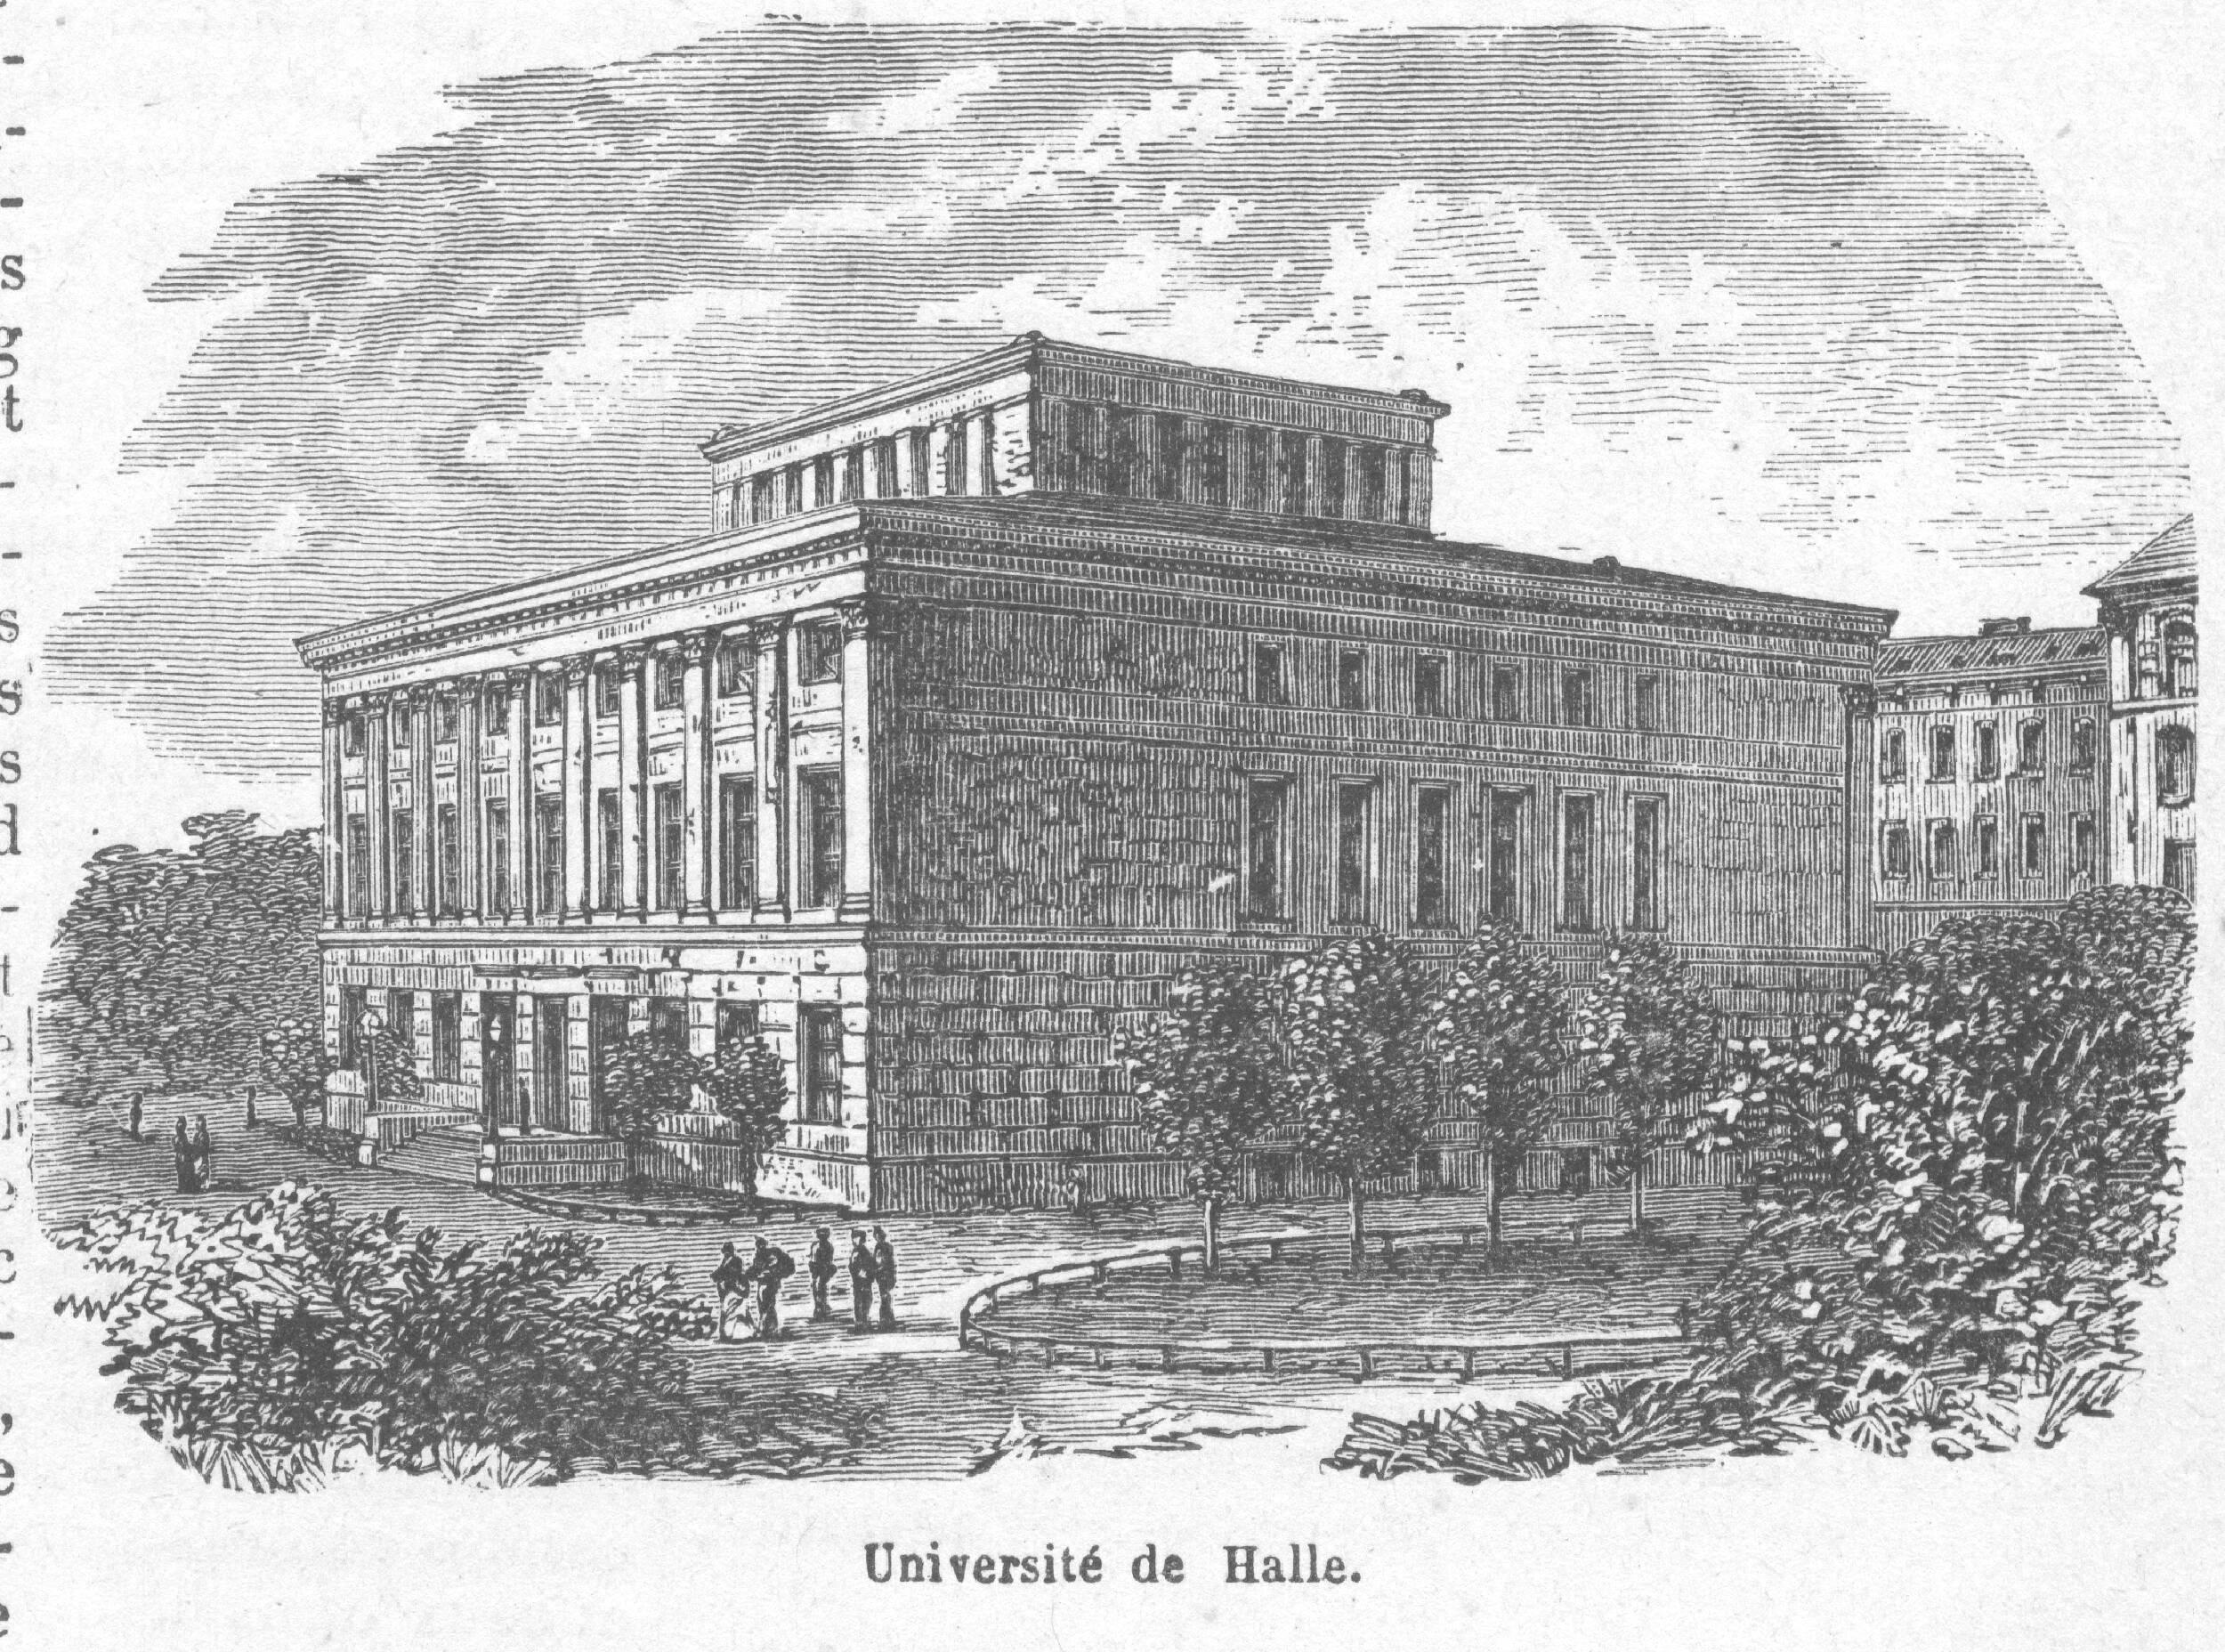 Halle University  Old Book Illustrations